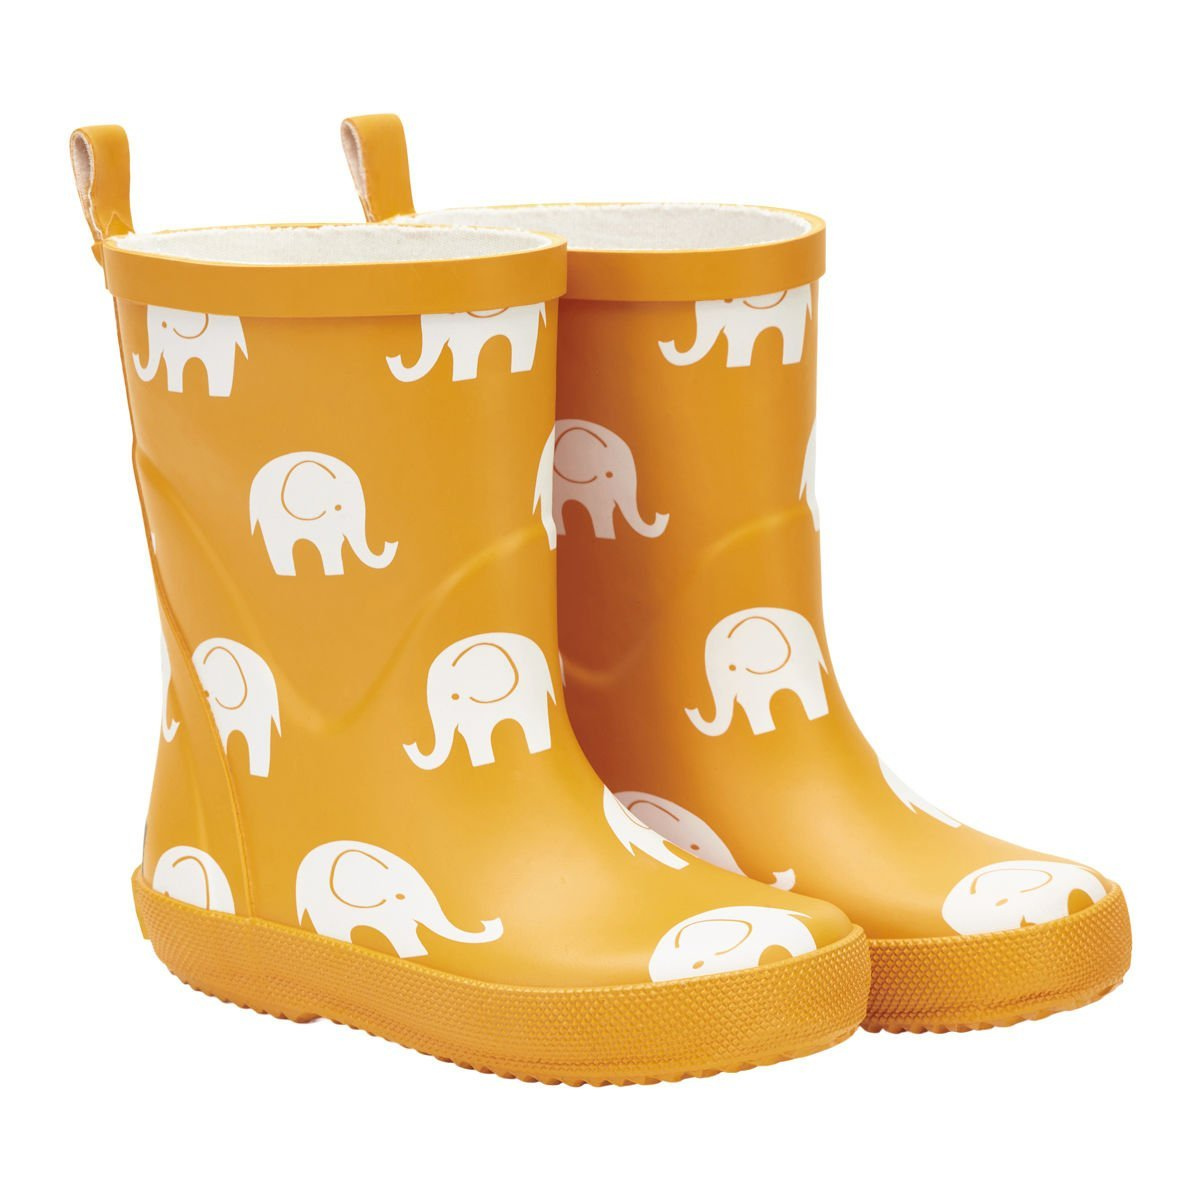 Cizme din cauciuc natural pentru copii yellow elephant CeLaVi